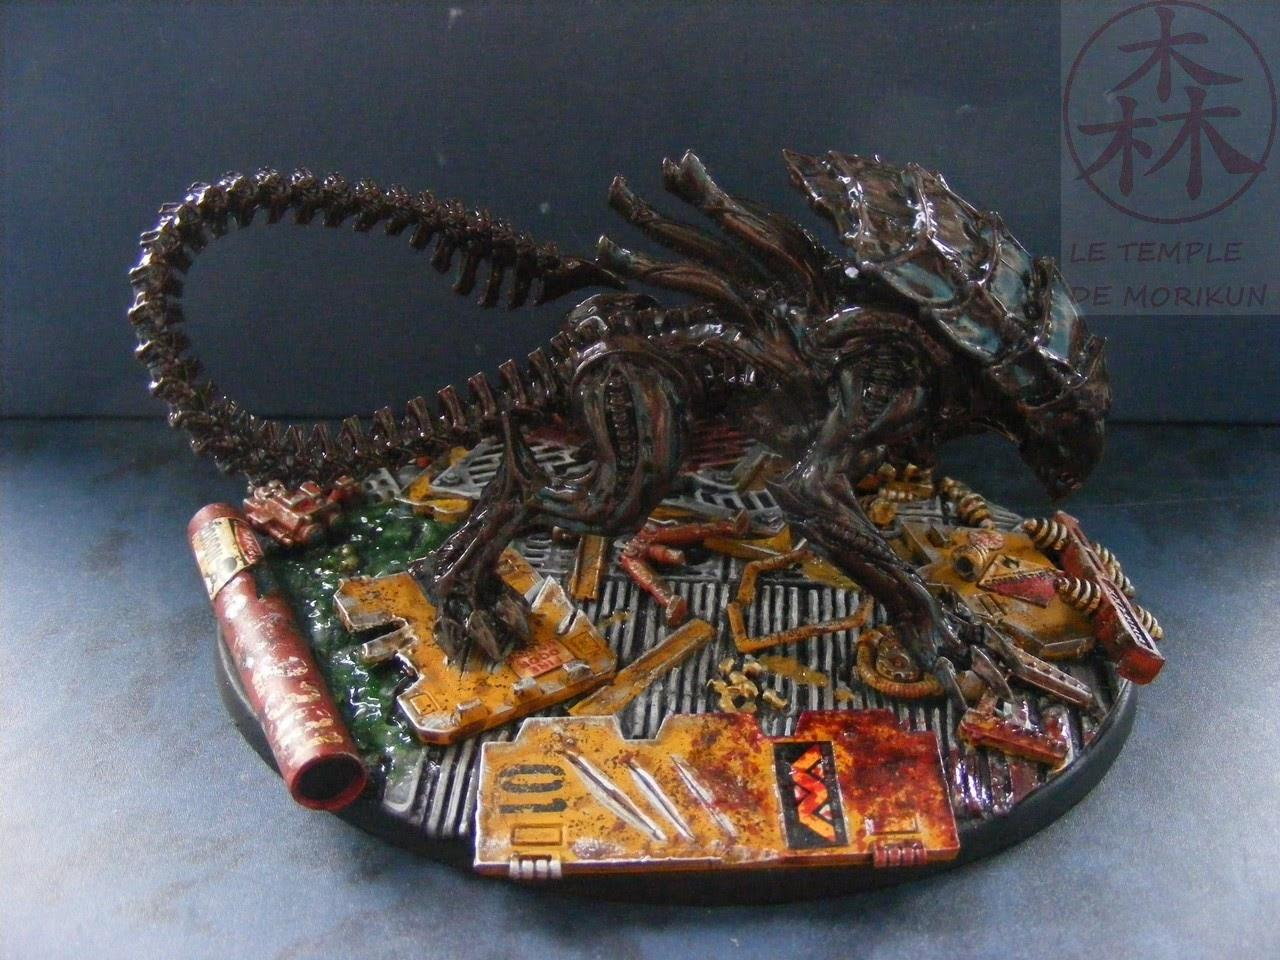 Alien, Avp, Basius 2, Crusher, Morikun, Prodos